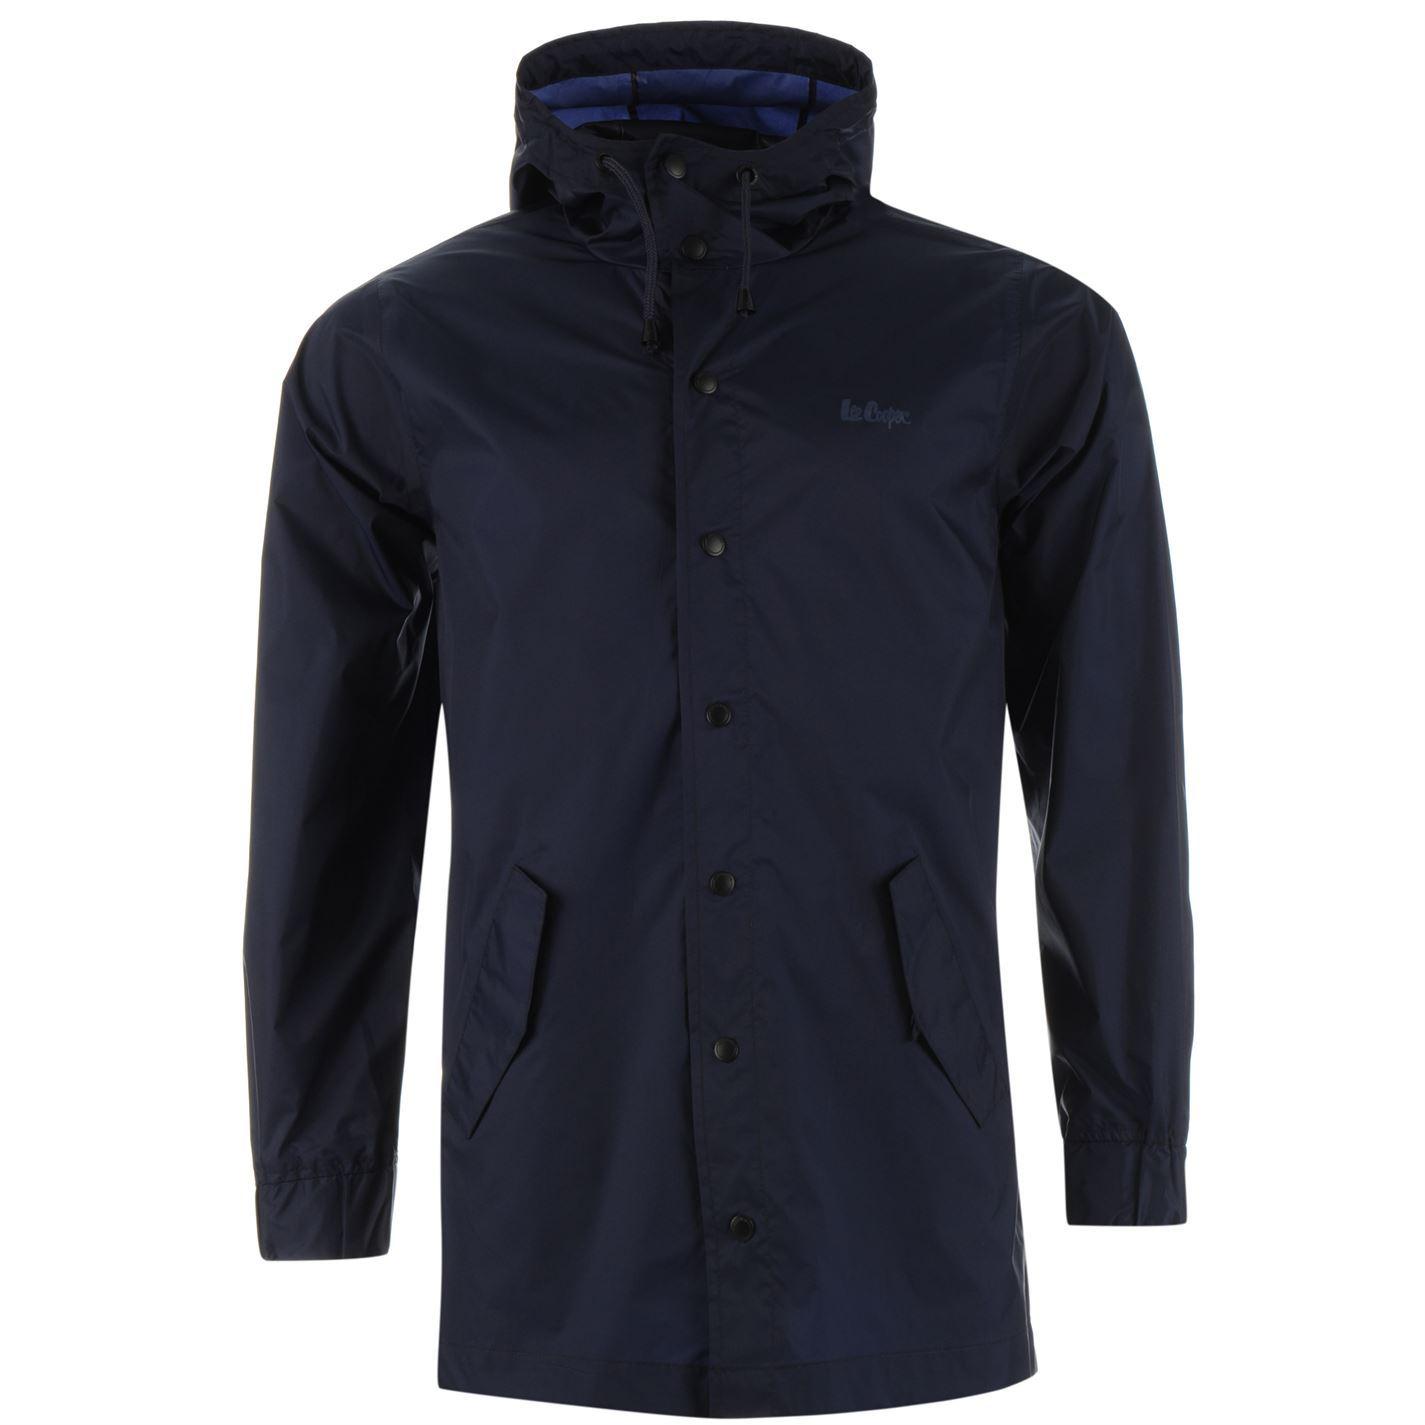 lee cooper mens packable rain jacket coat top long sleeve water #1: c6e18d81 e9d2 4749 9422 9dc51e